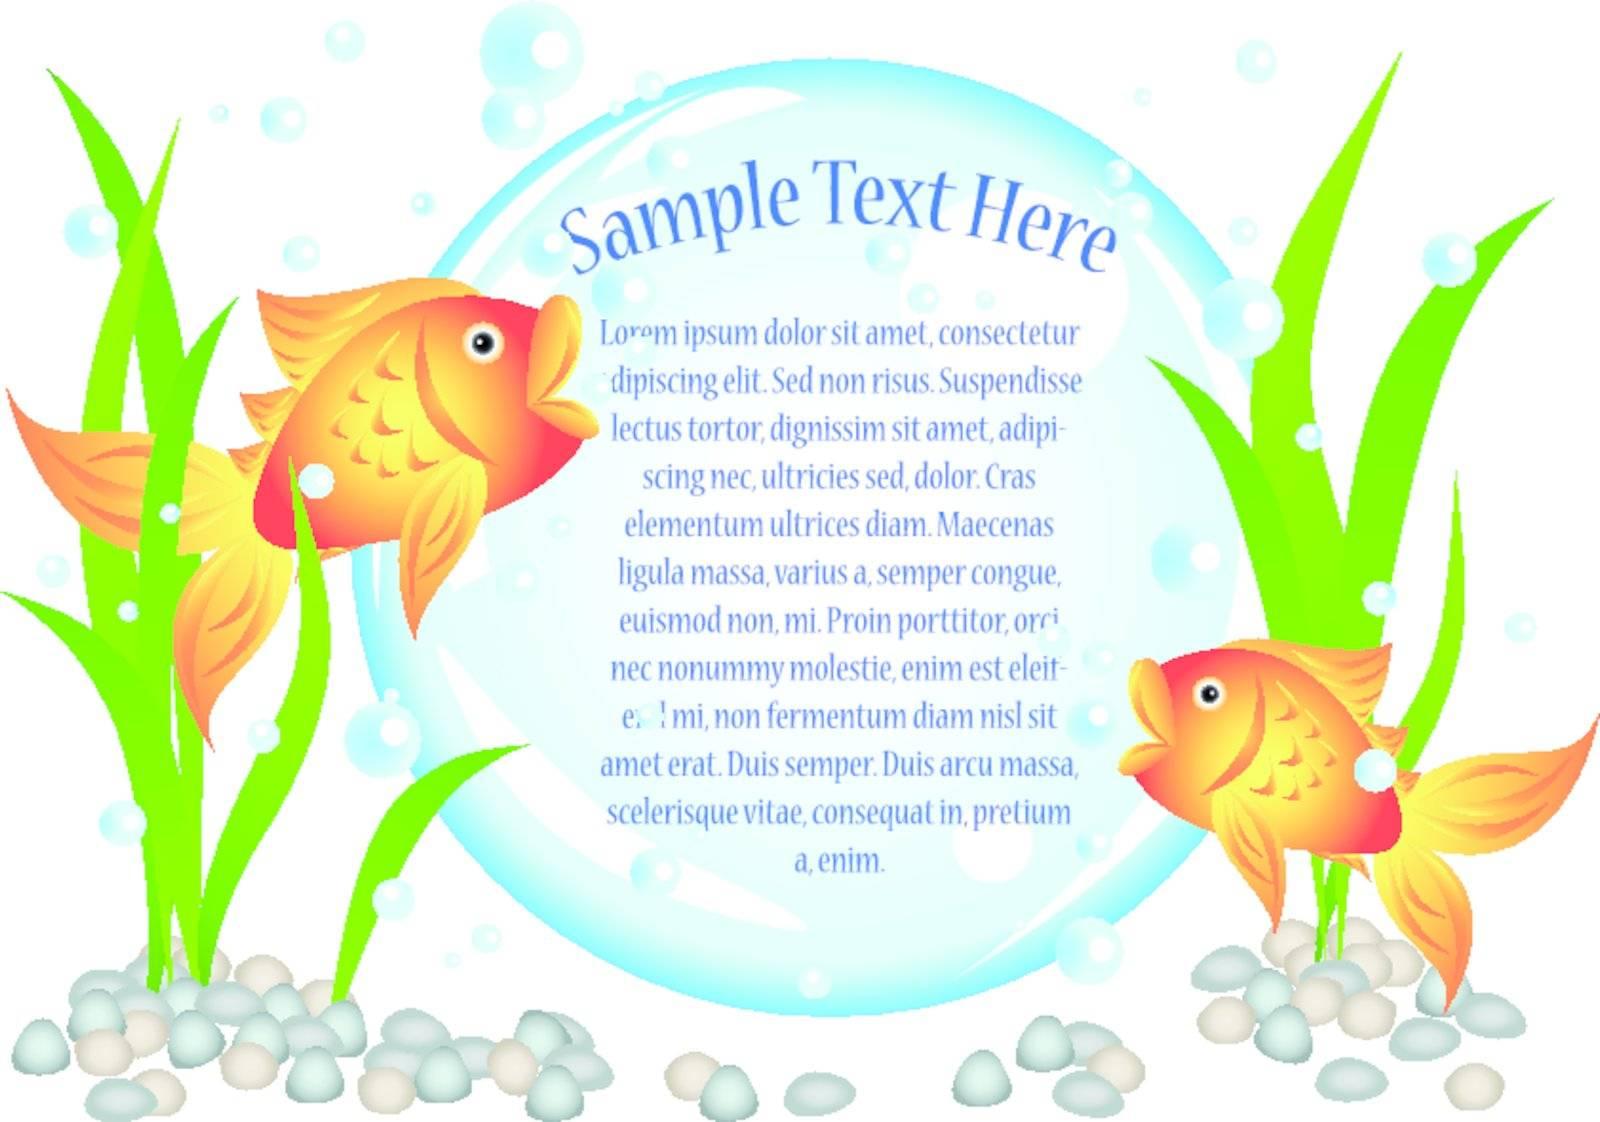 Goldfish advertisement by Mirage3